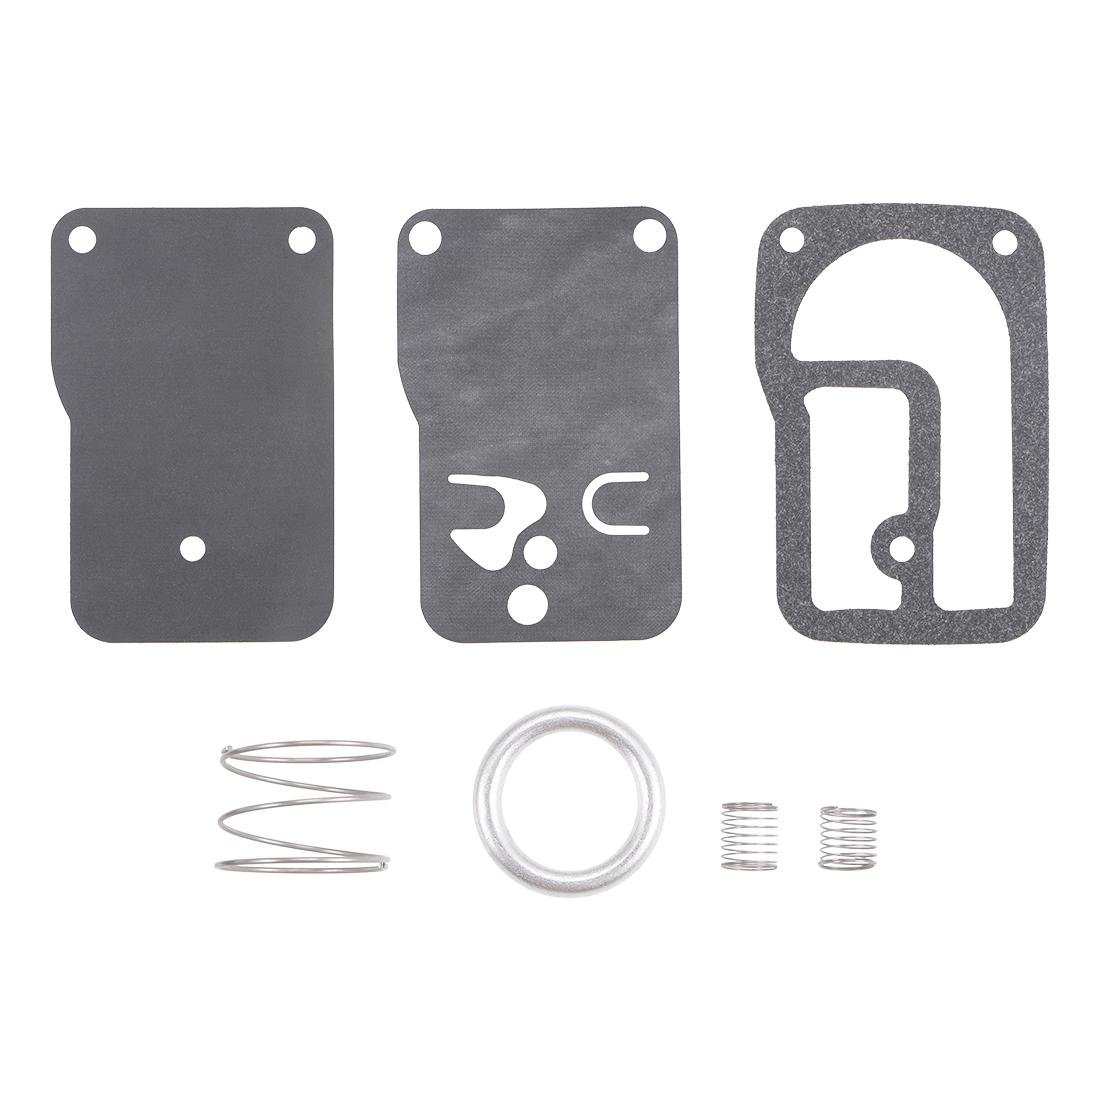 393397 Carburetor Rebuild Kit for Briggs Stratton 393397 Fits 253400-255400 3pcs